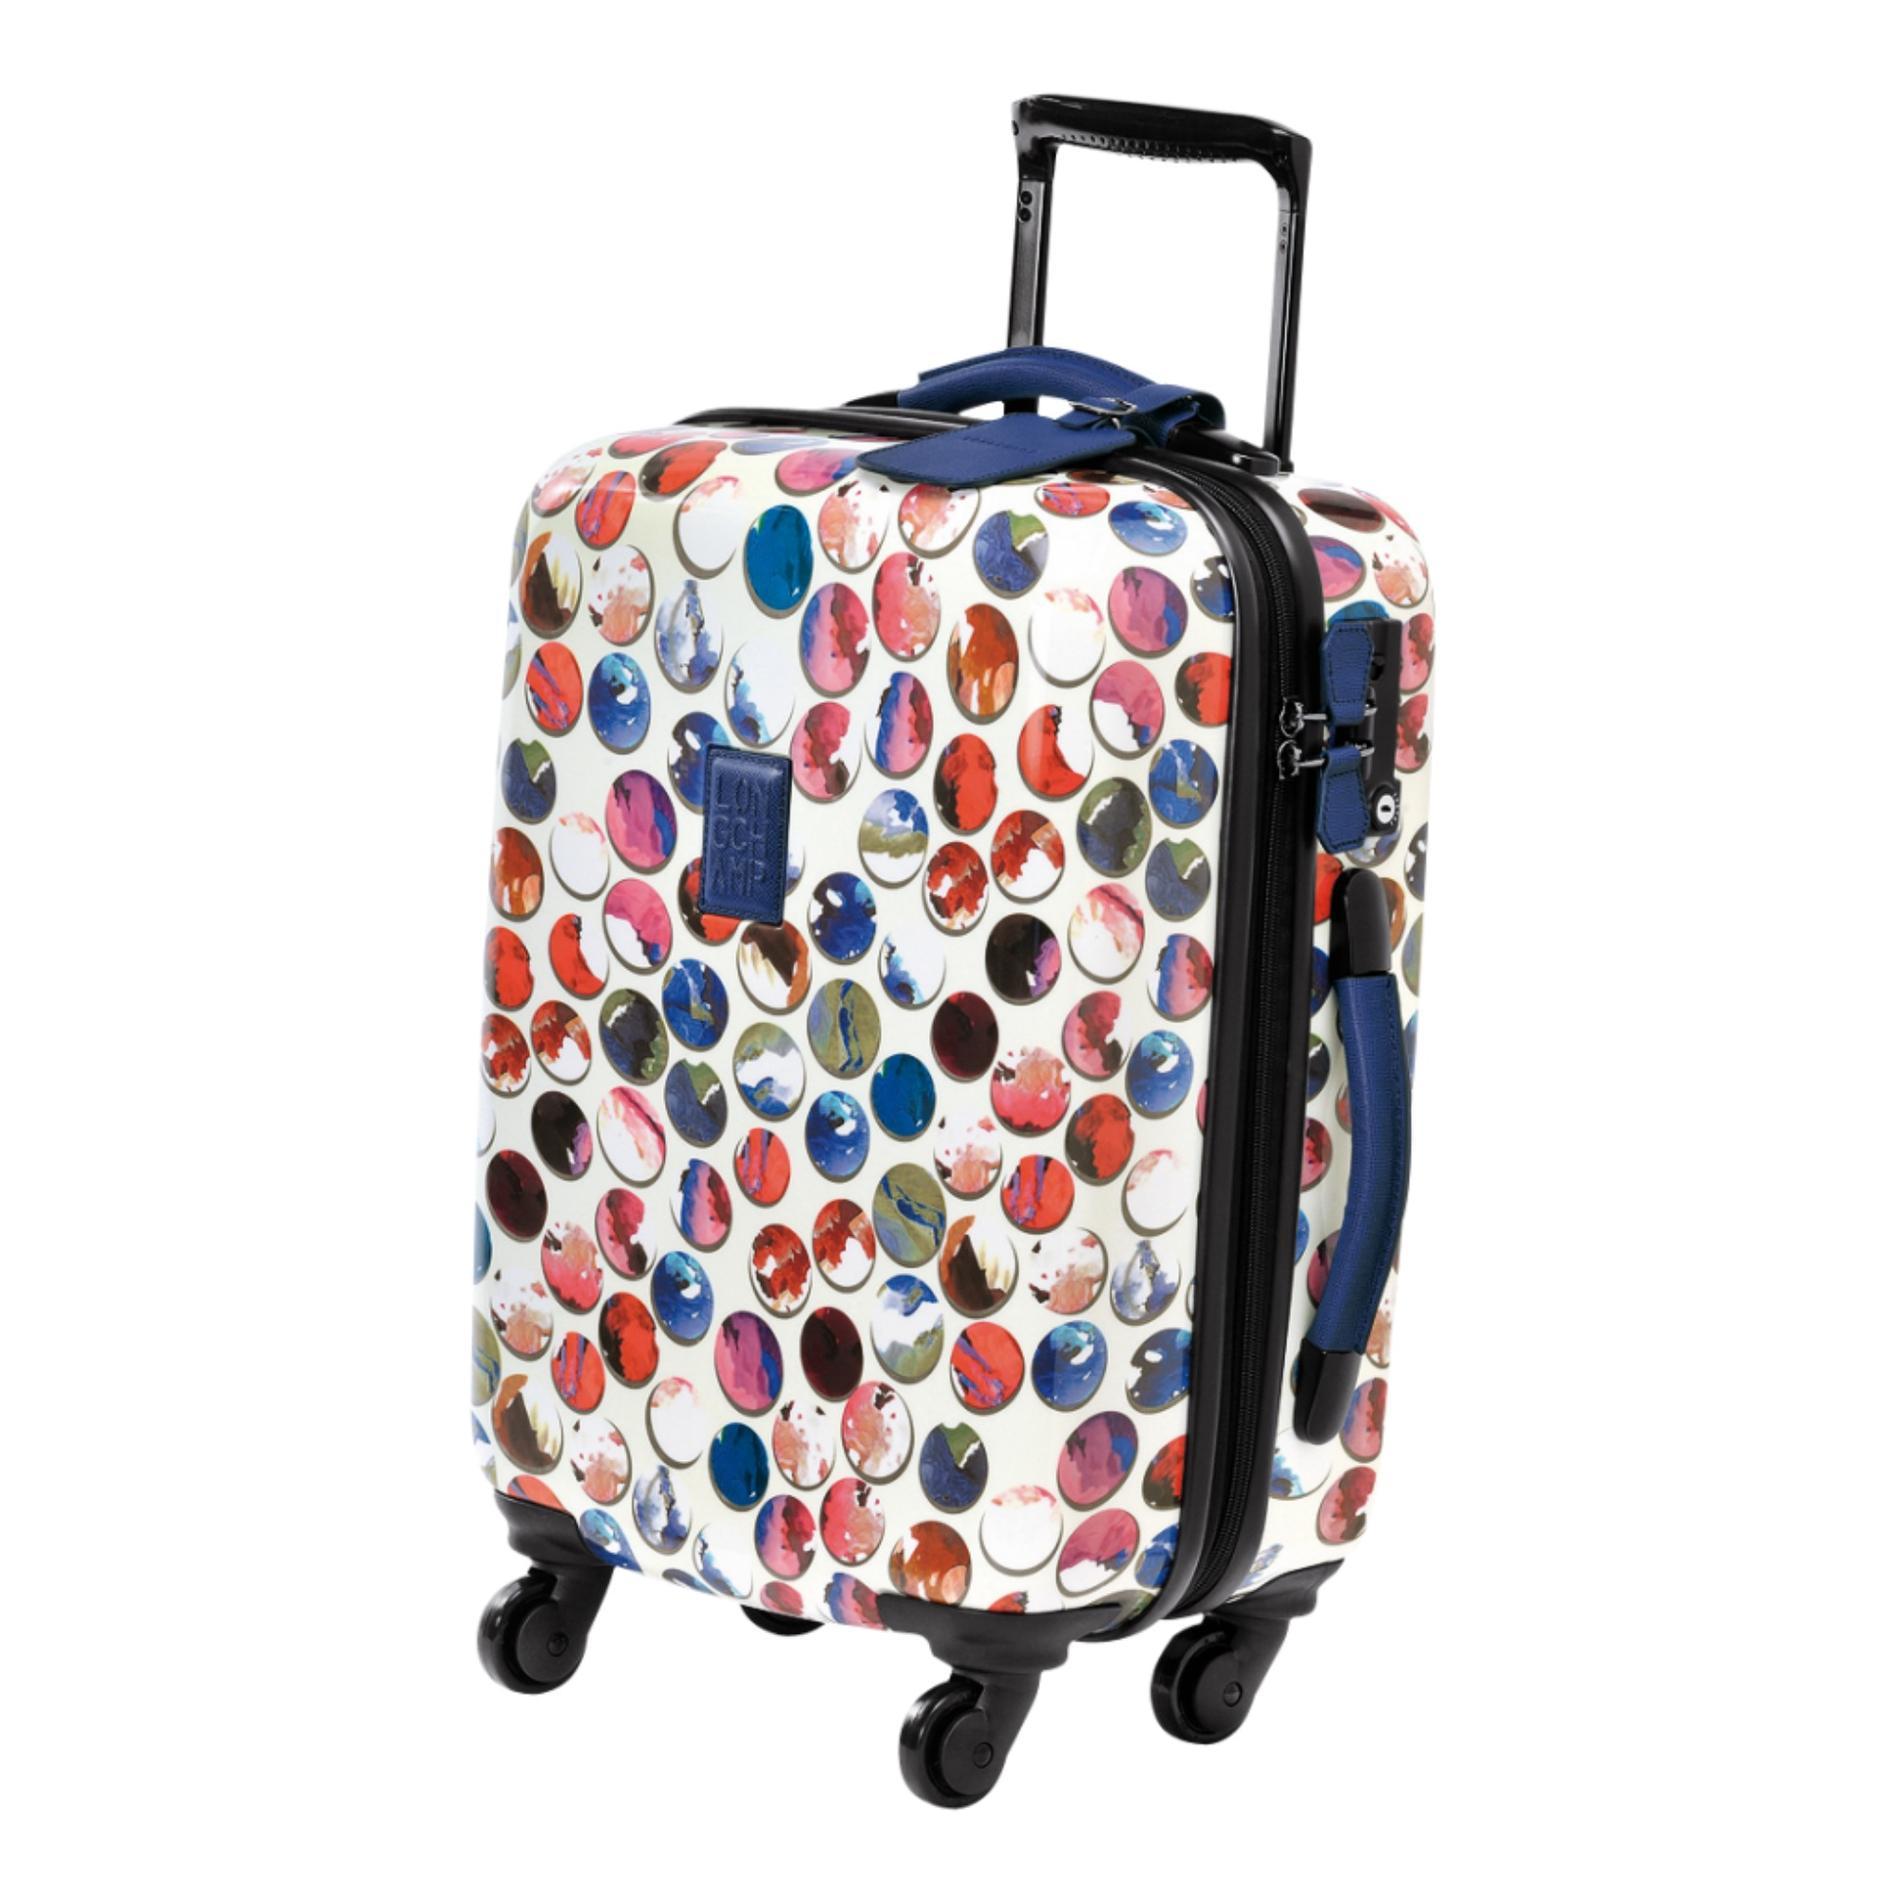 quelle valise cabine chic pour un week end vasion madame figaro. Black Bedroom Furniture Sets. Home Design Ideas